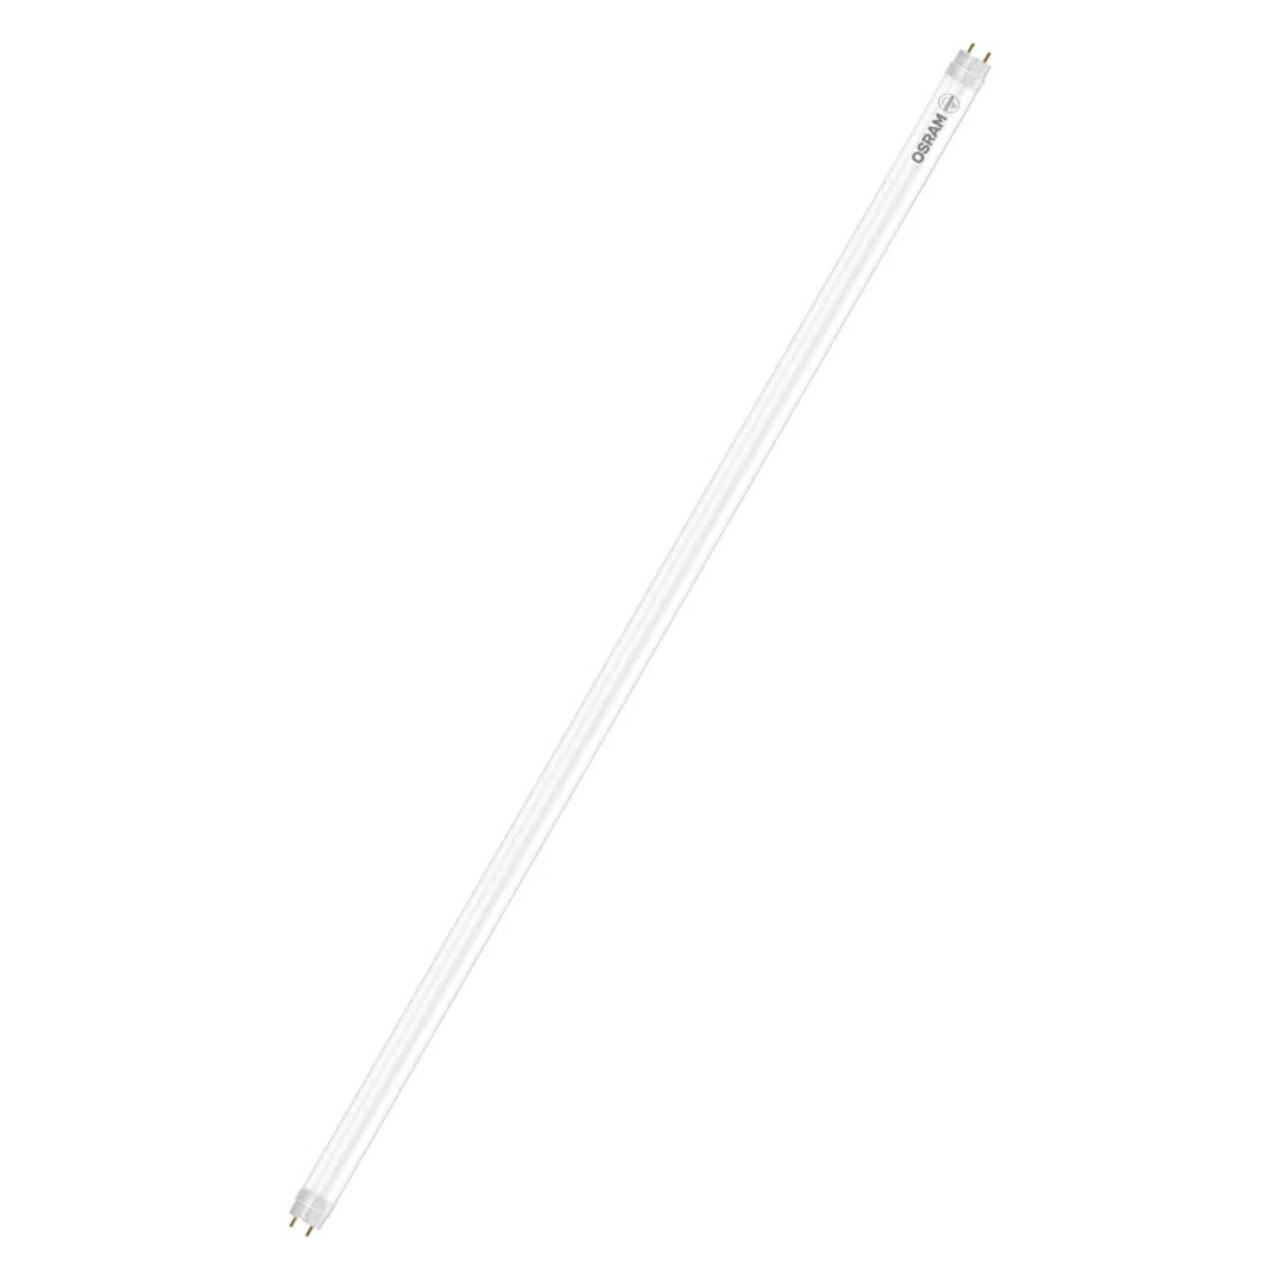 OSRAM SubstiTUBE Star 16-4-W-T8-LED-Röhrenlampe 120 cm- kaltweiss